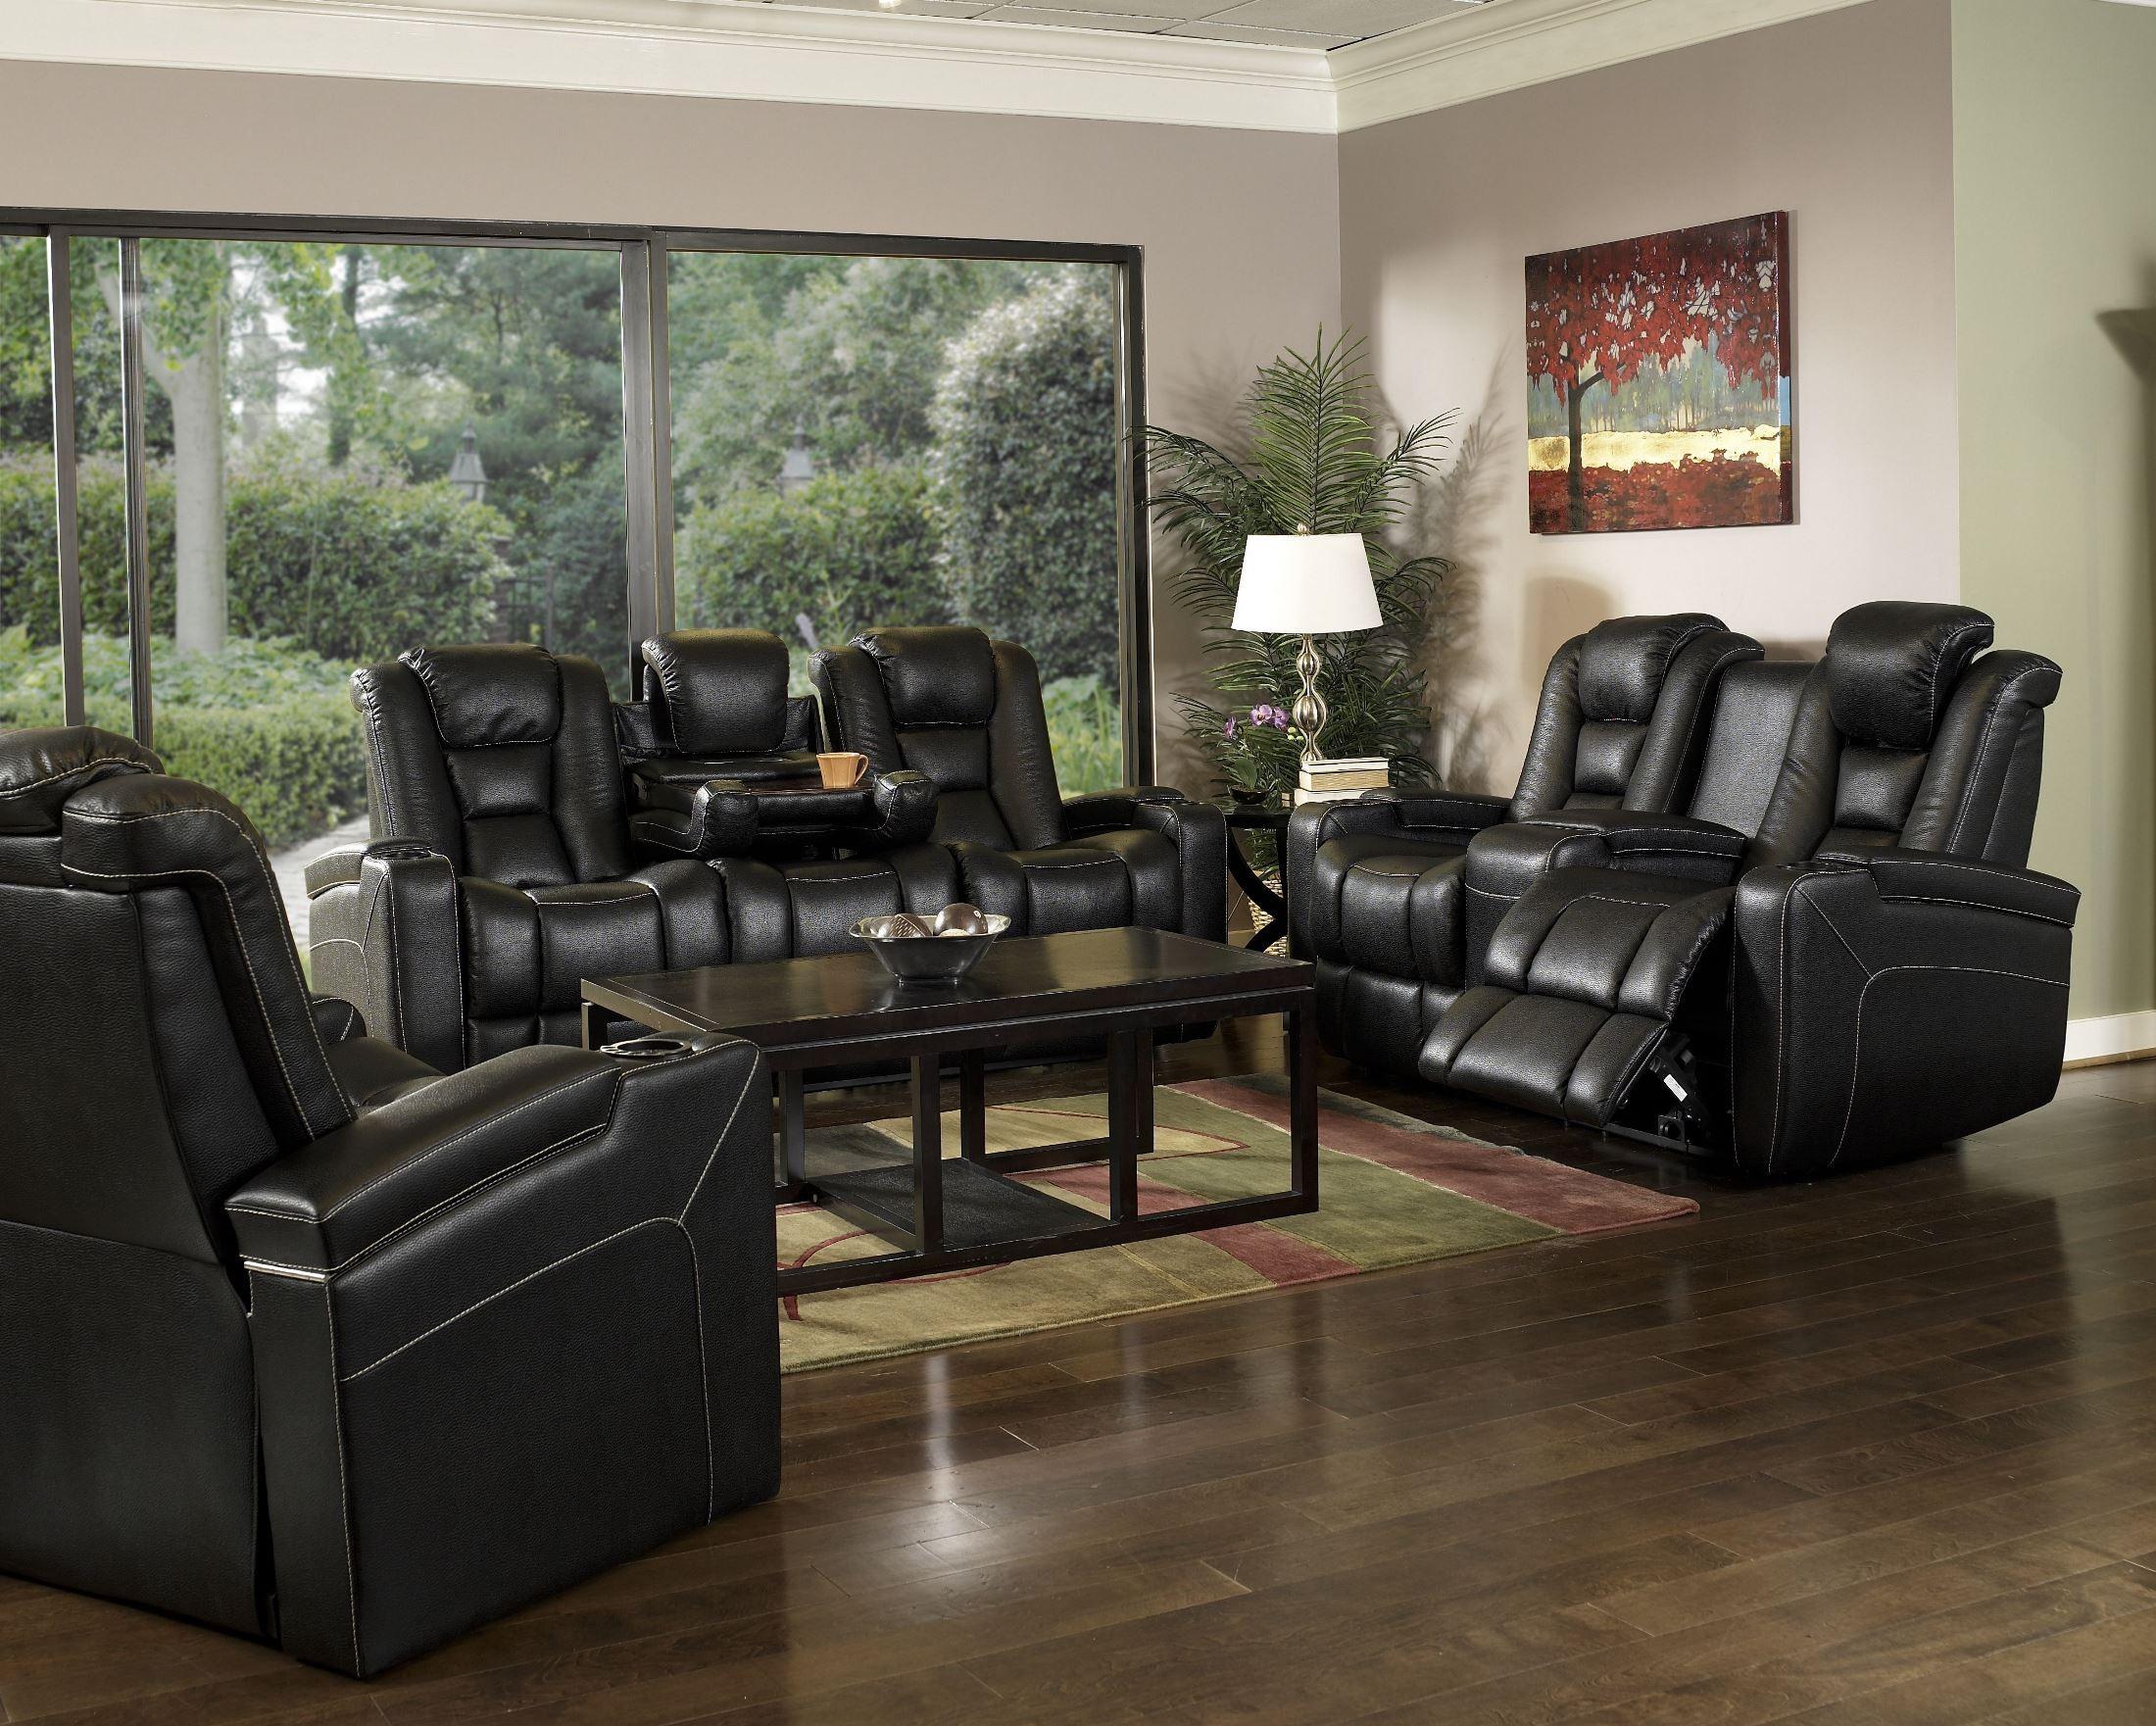 Evolution black leathaire fabric power reclining living - Fabric reclining living room sets ...